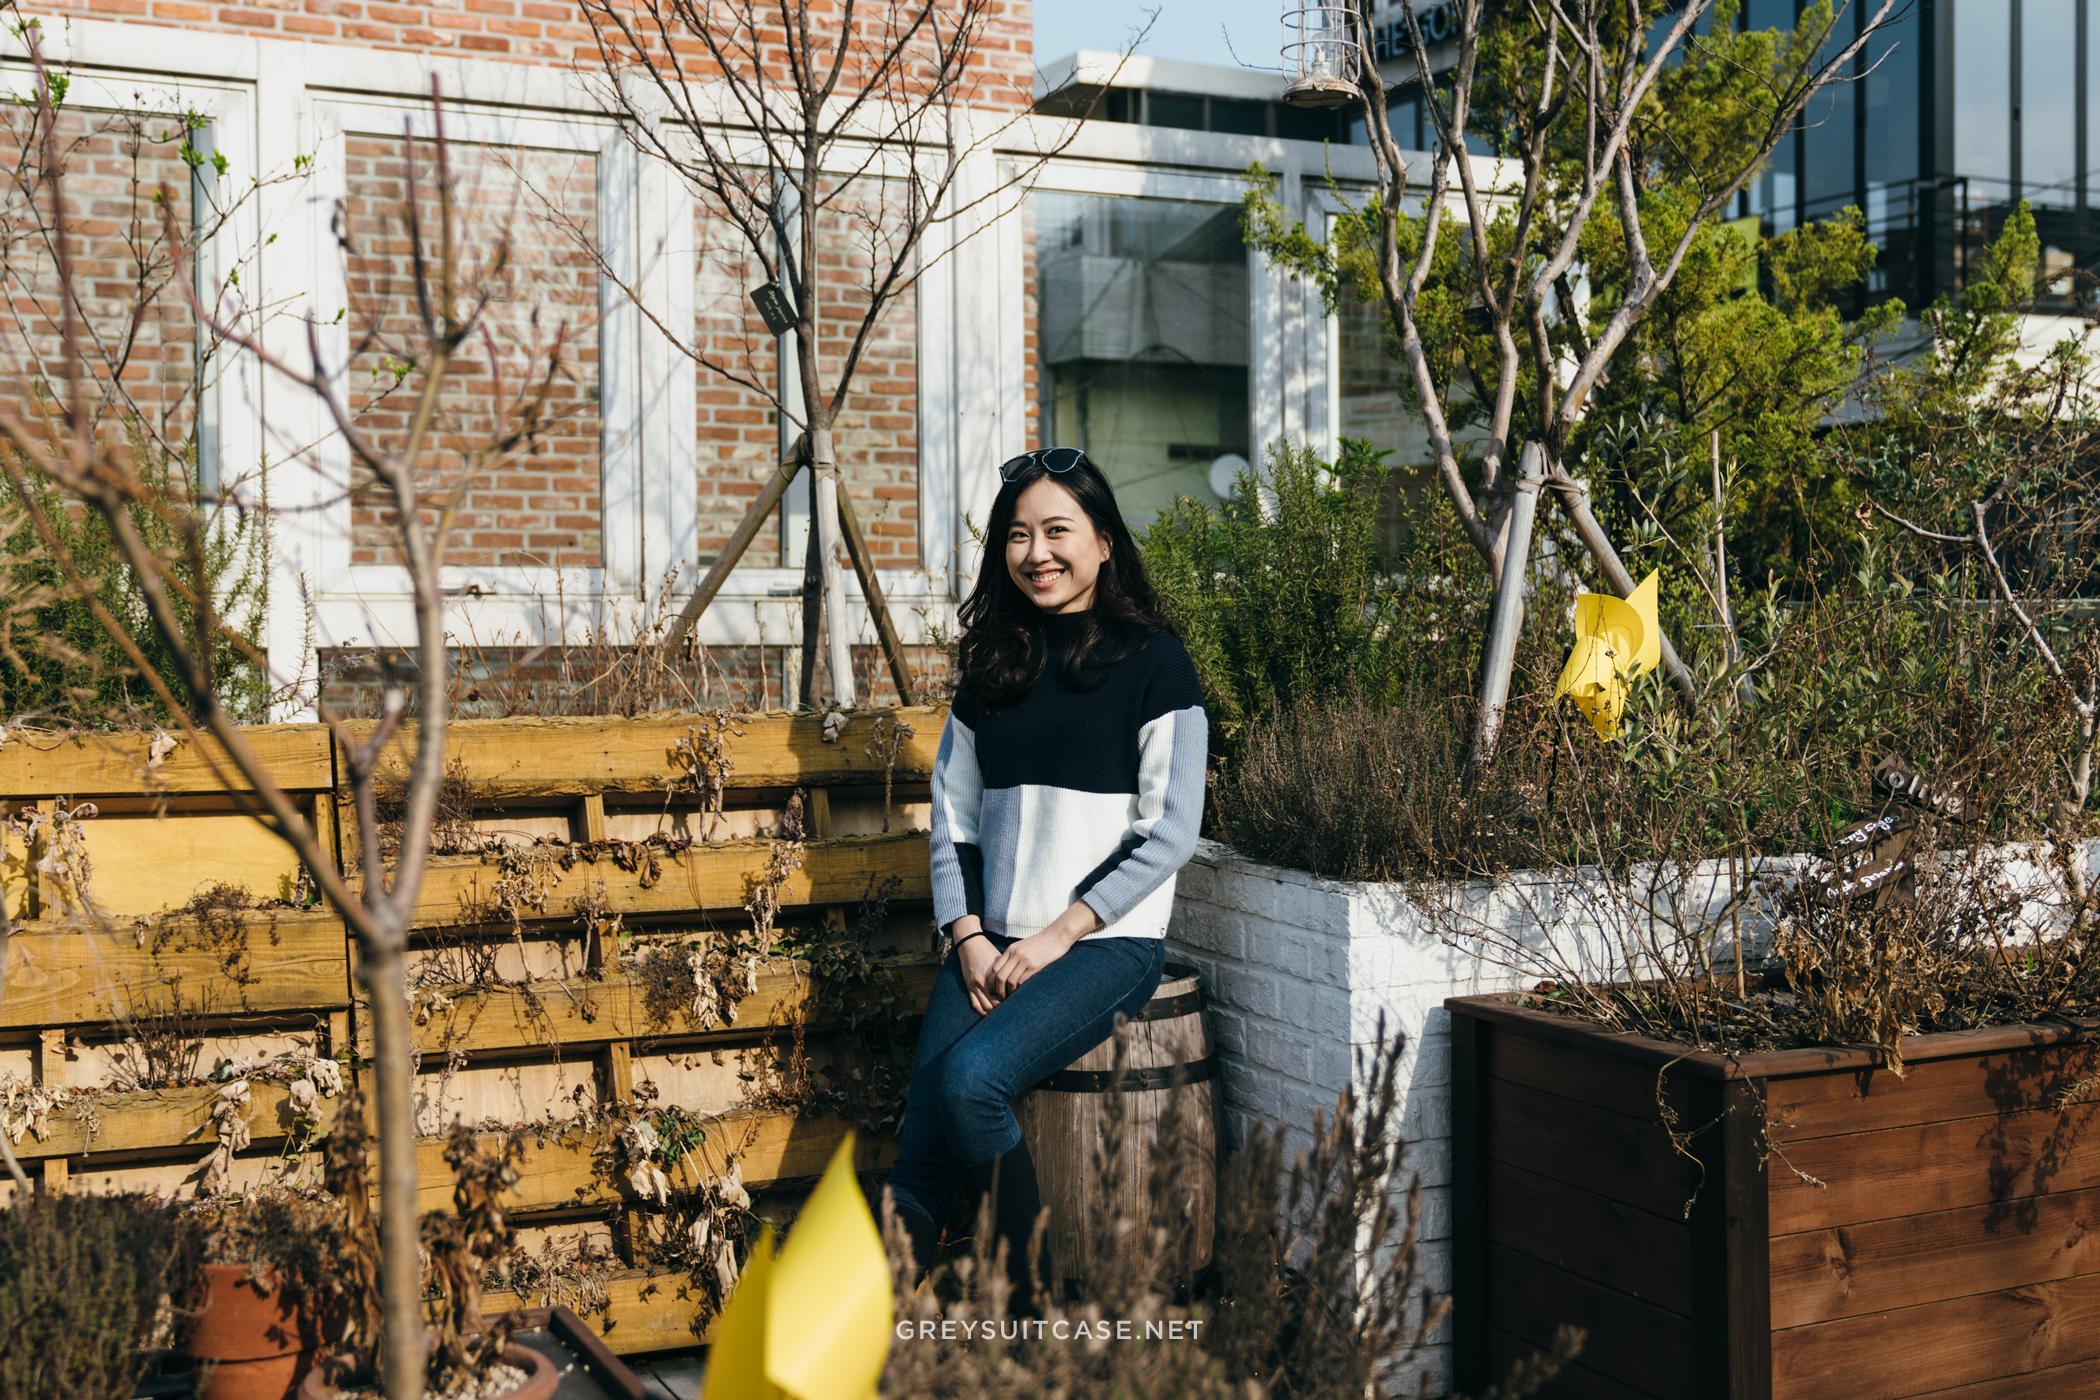 Greysuitcase Travel Series - Seoul Spring '17 - Skinfood Cafe, Garosugil (가로수길), Seoul, South Korea